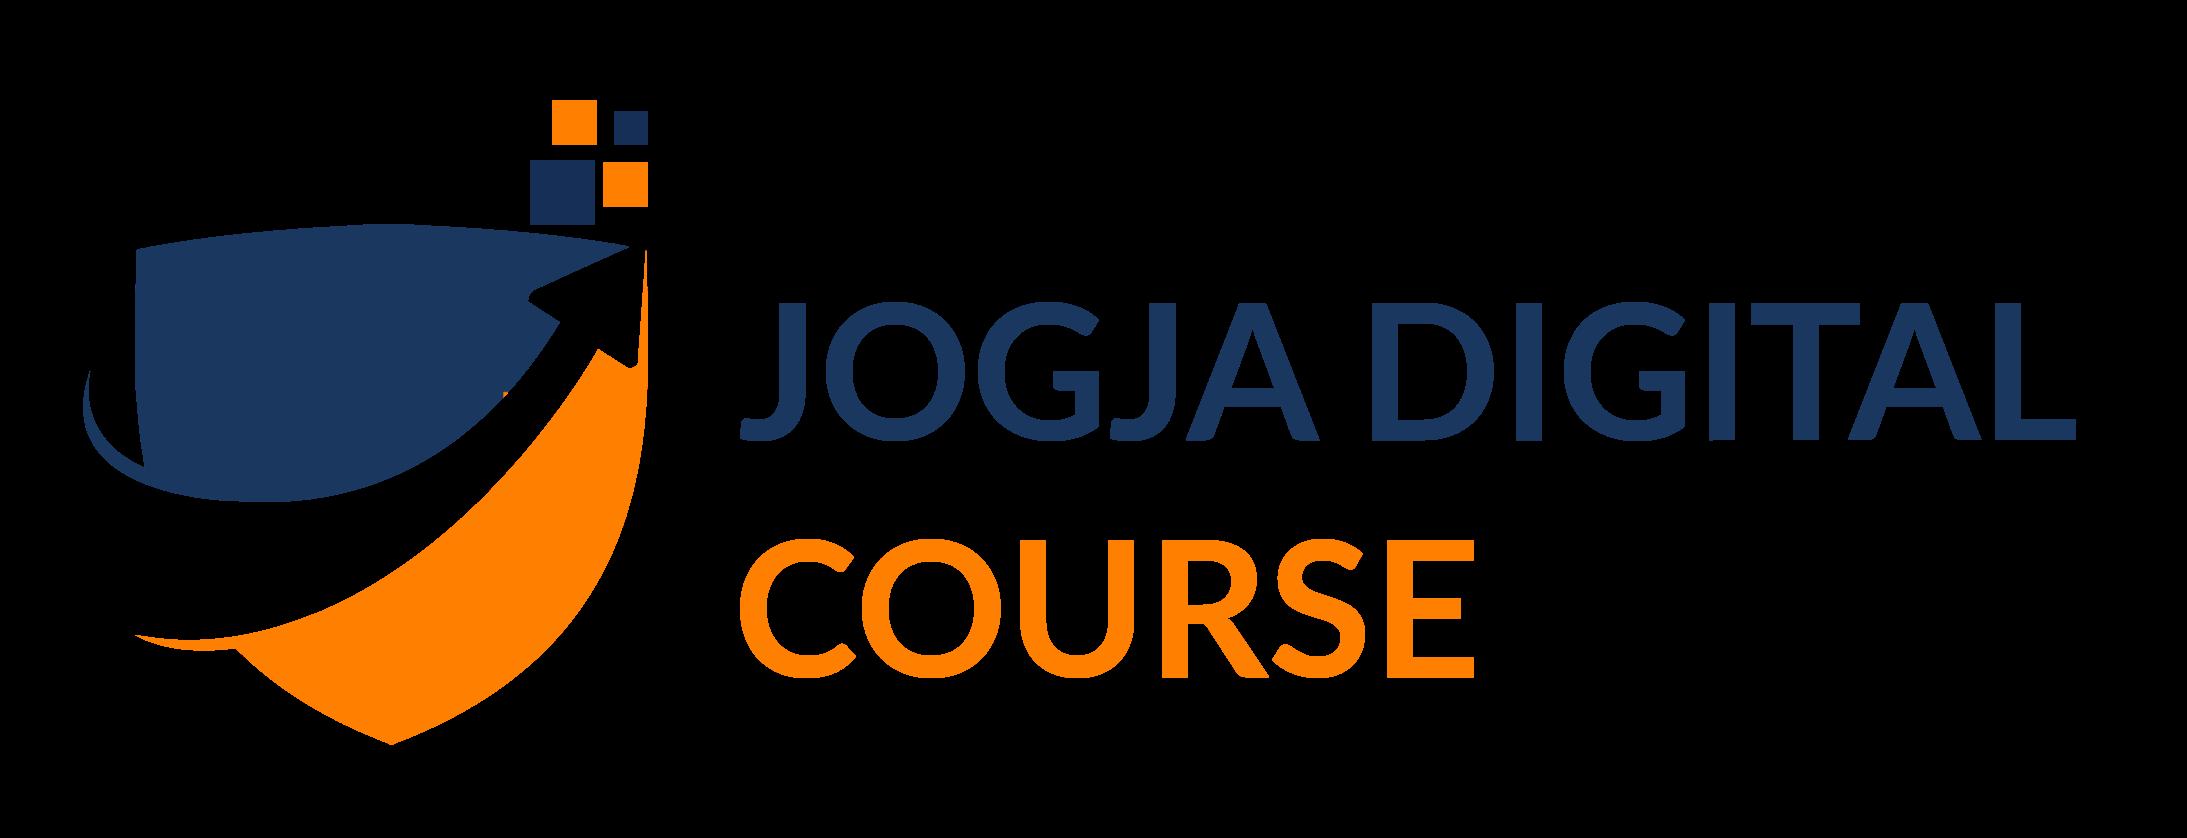 JogjaDigitalCourse.com™